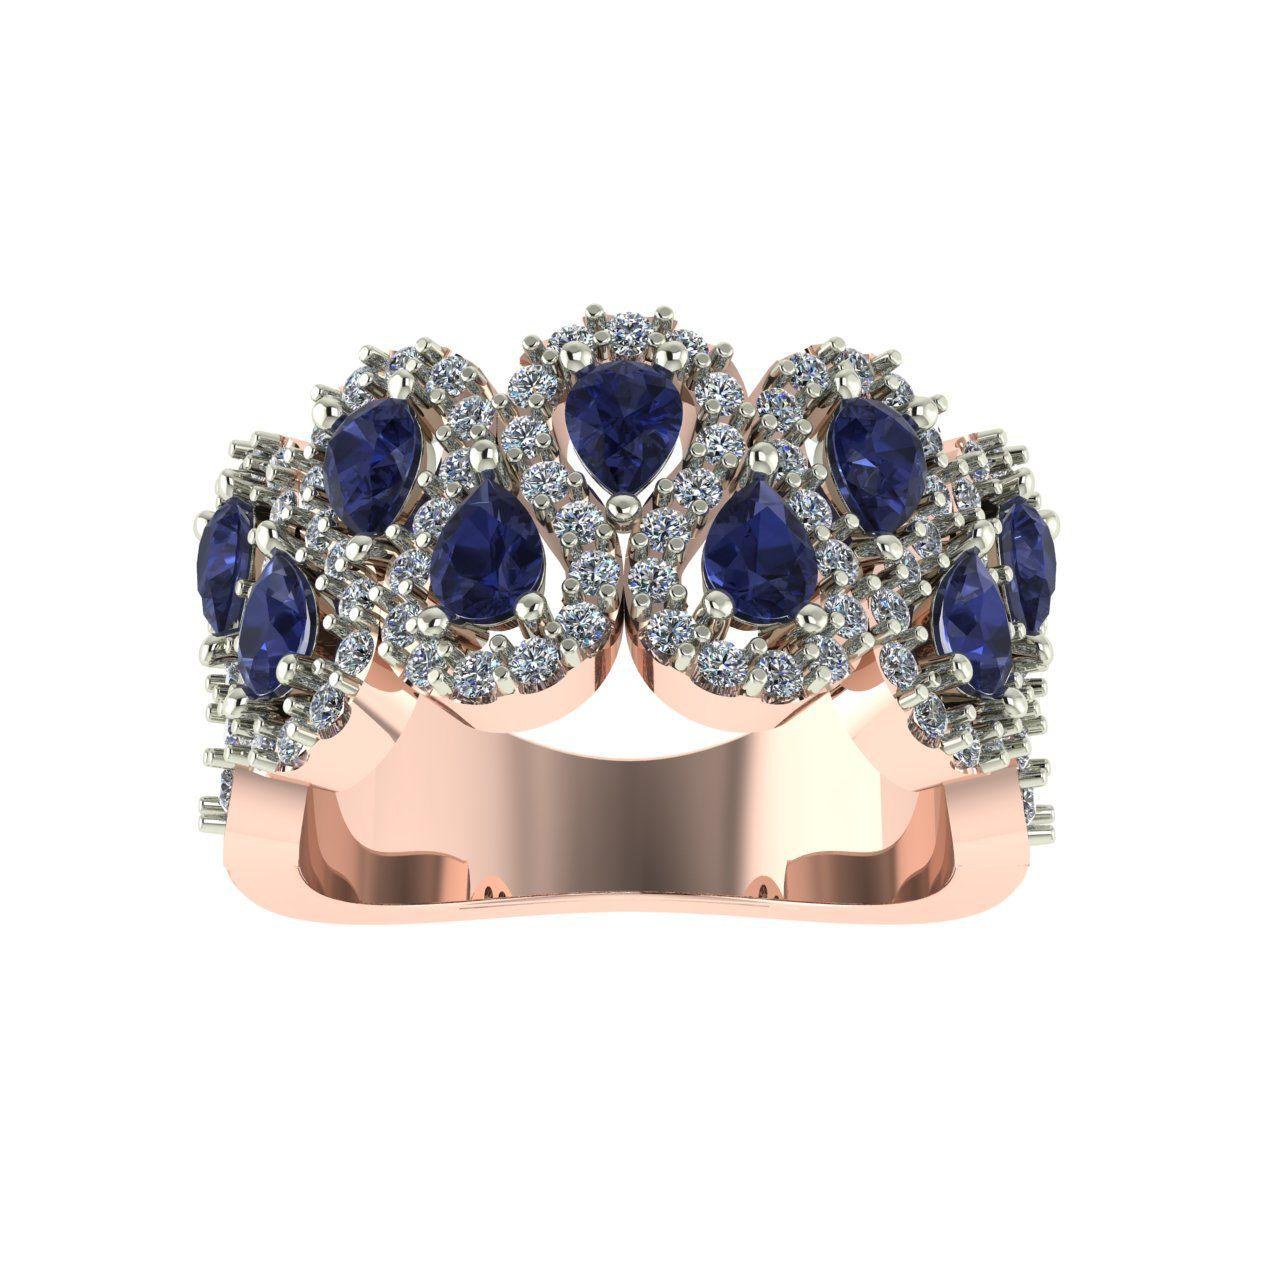 انگشتر طلا 18 عیار اونیکست مدل 2297 Sapphire